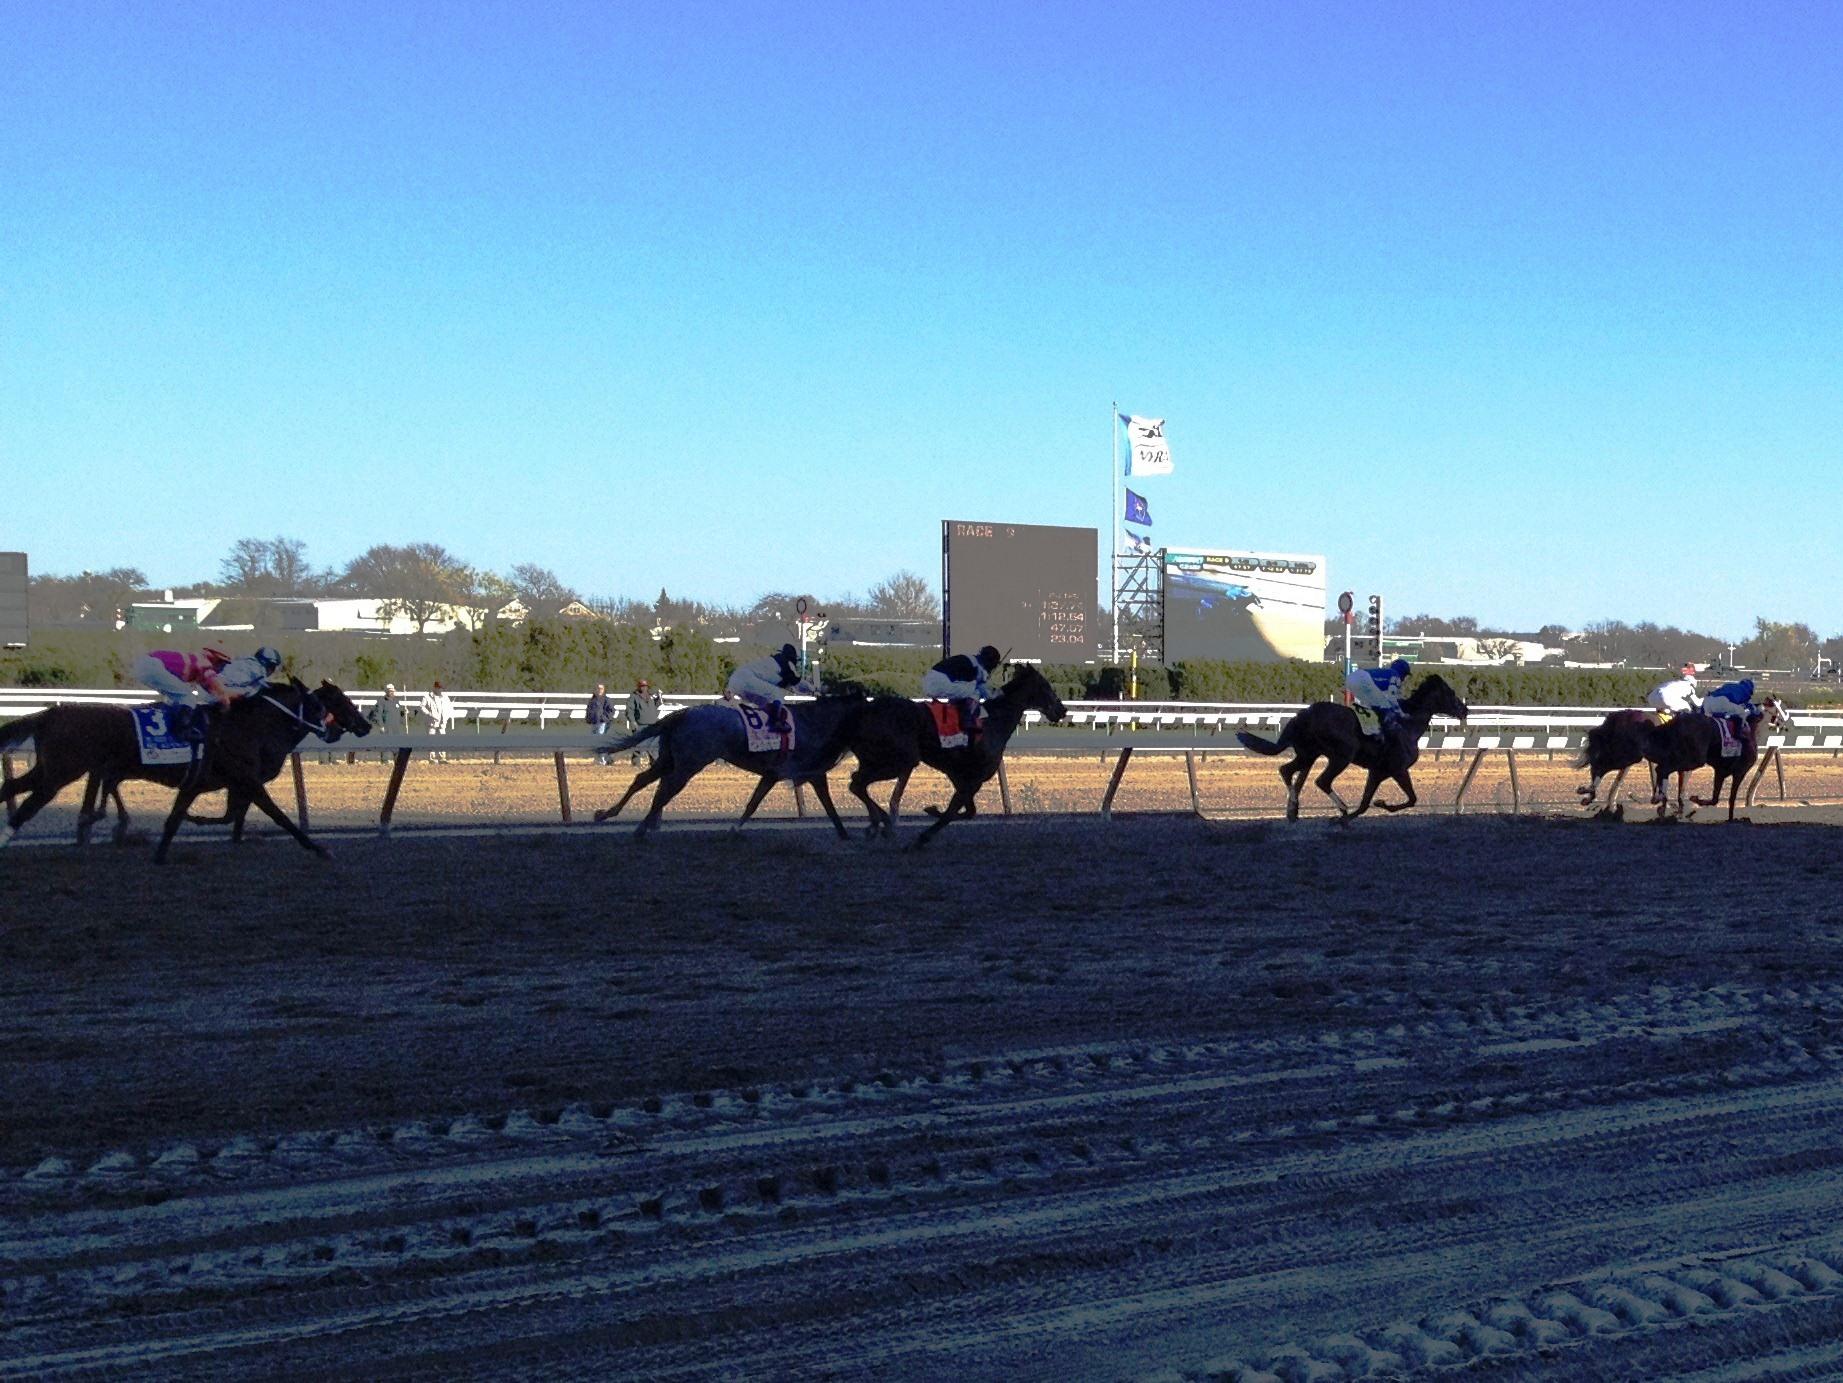 Anita park is Metro Turf Horse Racing Program worldwide sport and